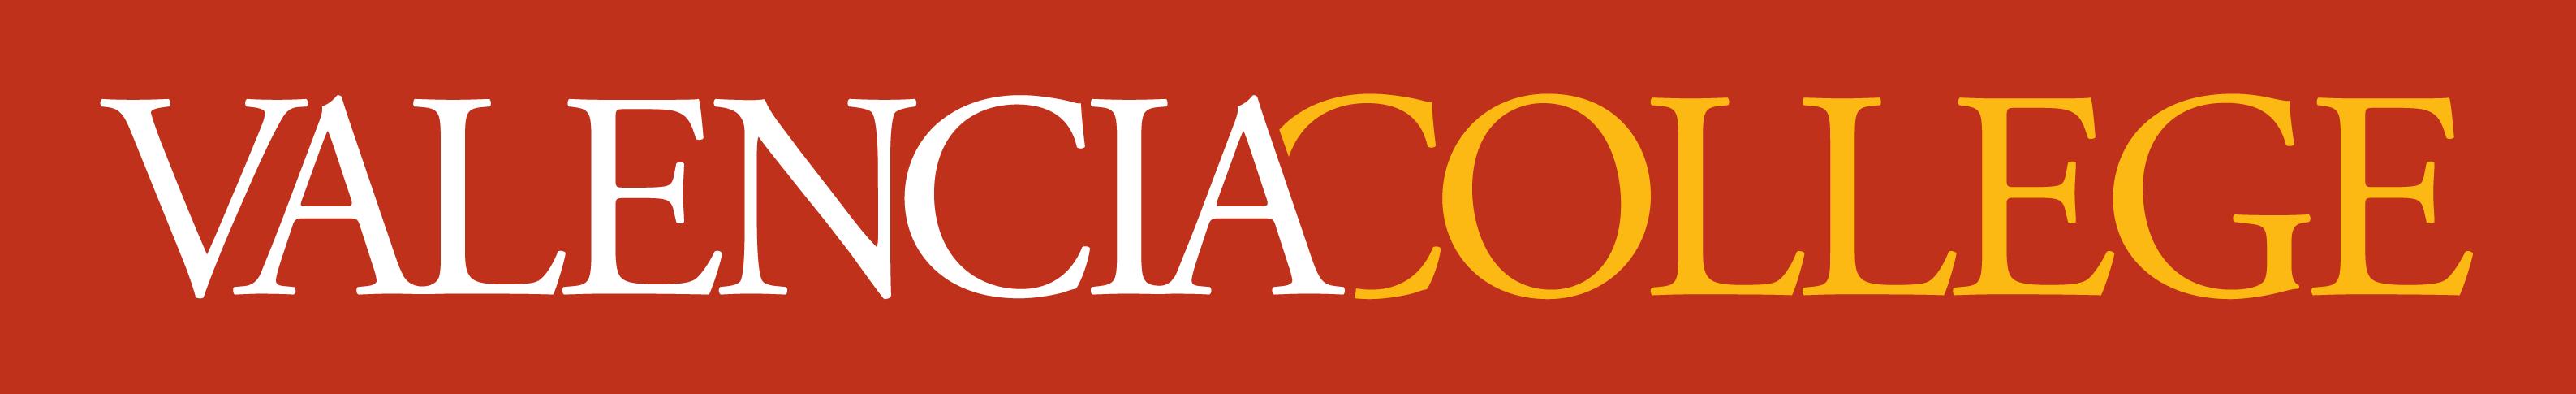 Valencia College Campus Store logo